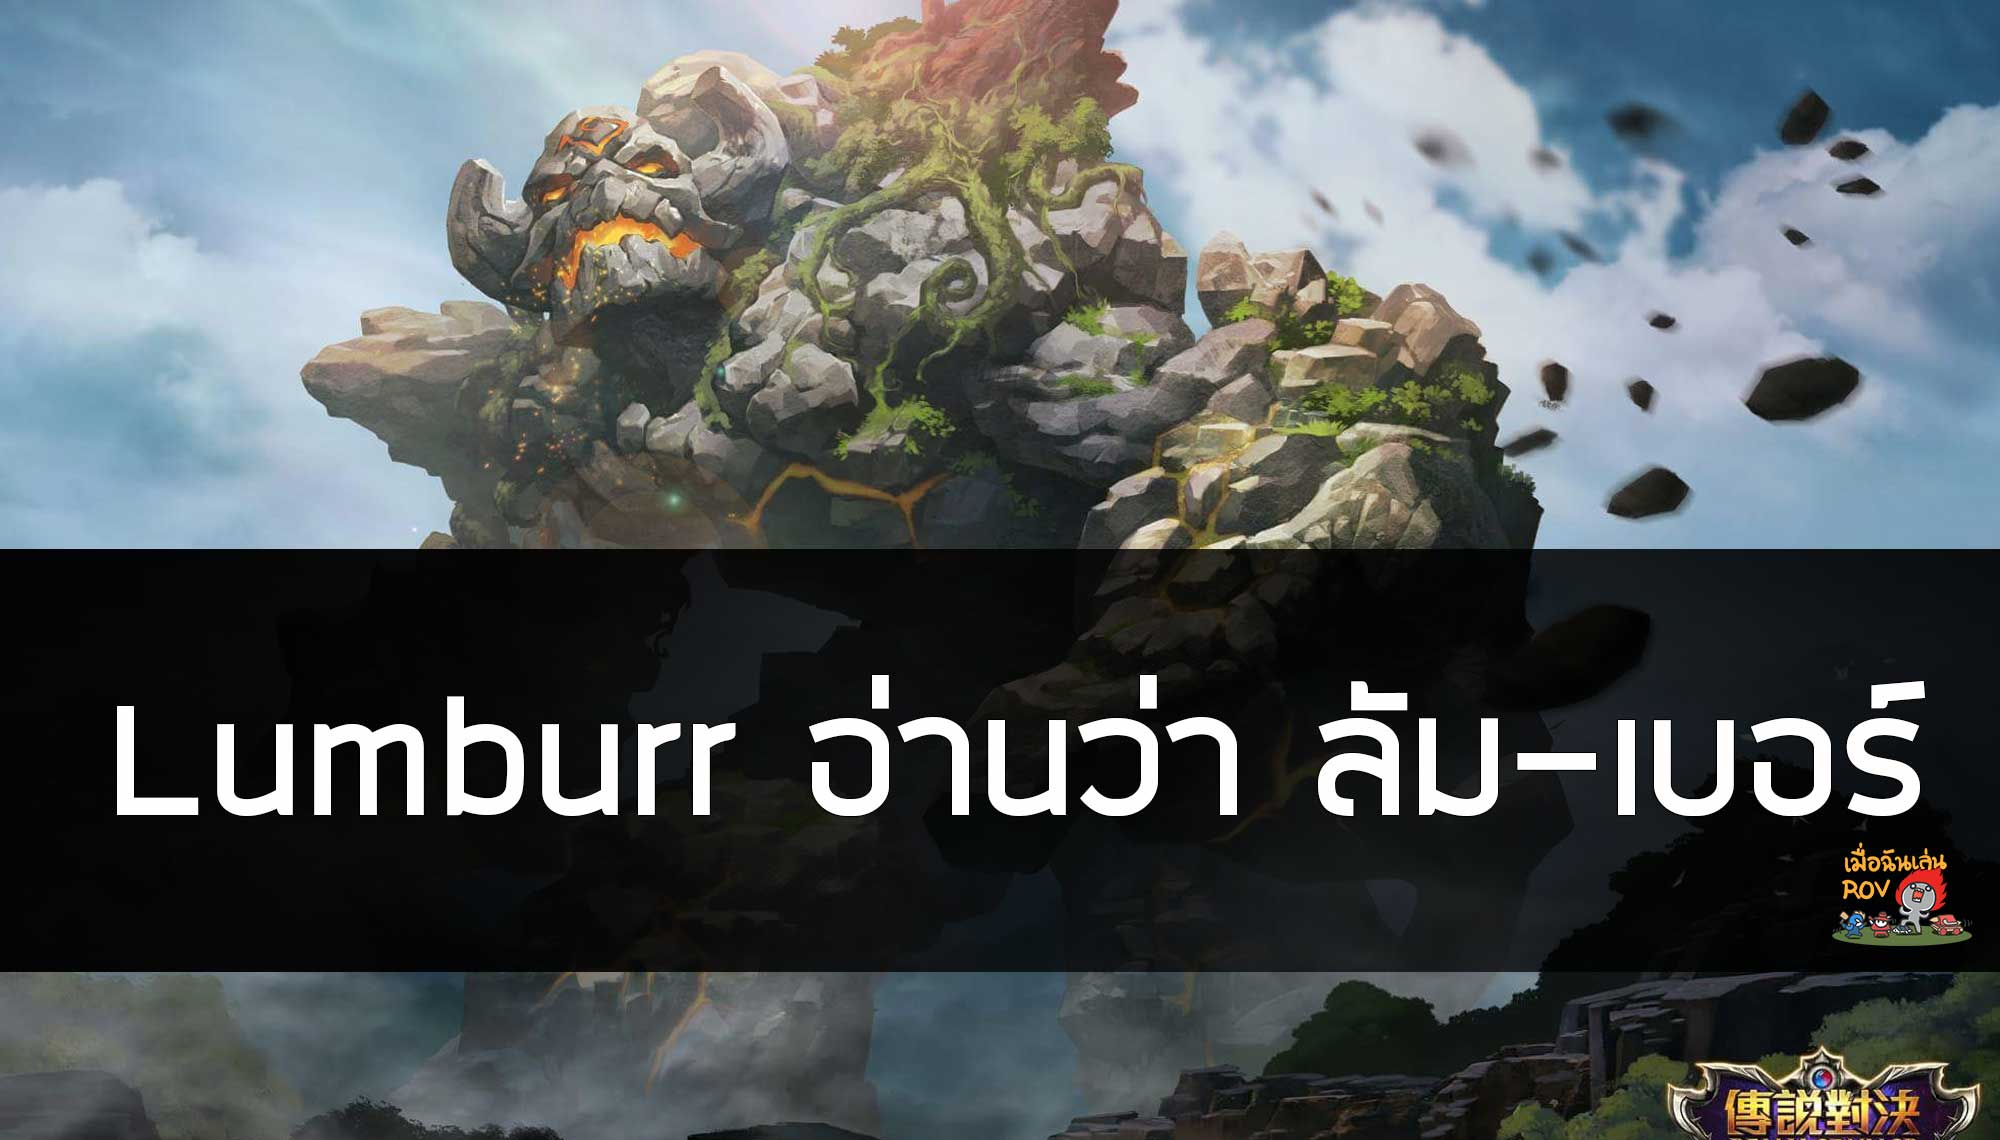 Lumburr อ่านว่า ลัม-เบอร์